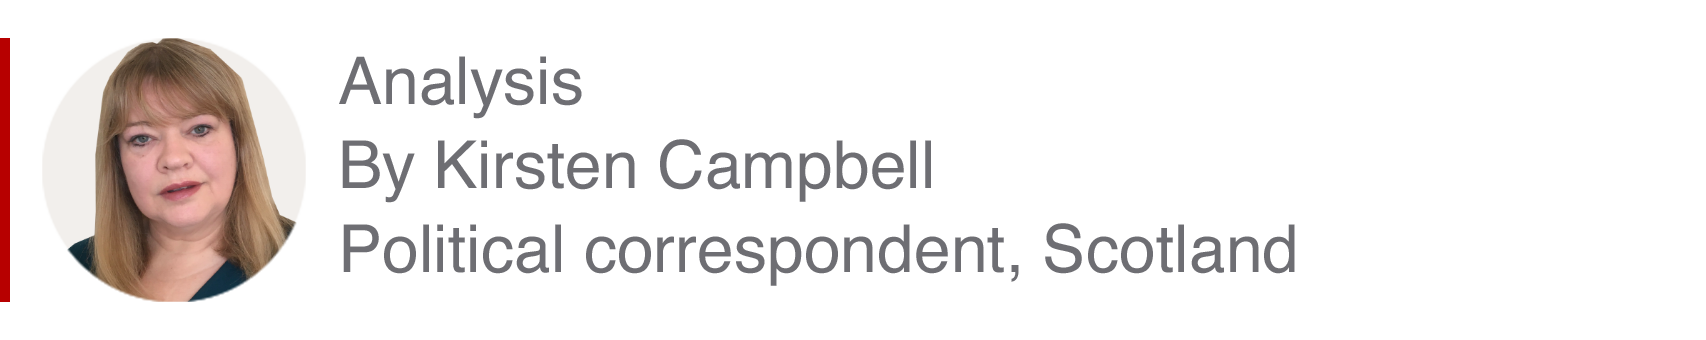 Analysis box by Kirsten Campbell, political correspondent, Scotland